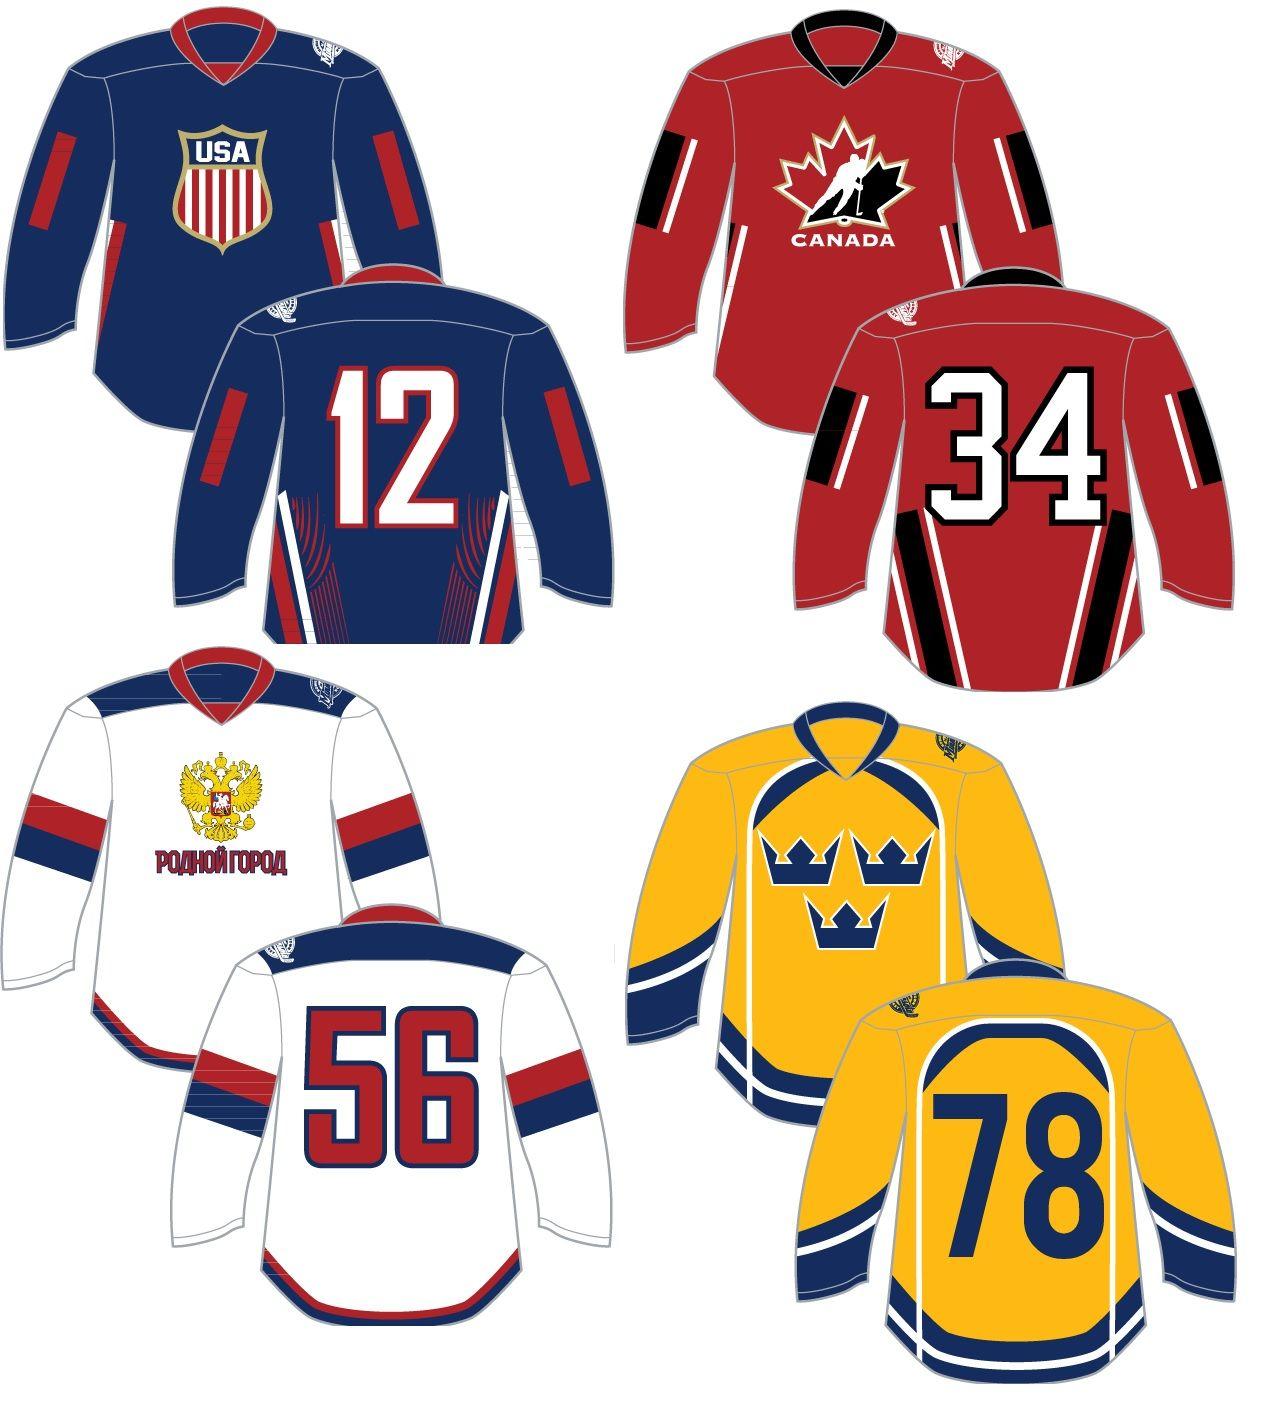 Model Your Spring Jerseys After Your Favorite Nation Hometown Hockey Did Usahockey Canadahockey Russiah Jersey Design Custom Jerseys Custom Hockey Jerseys